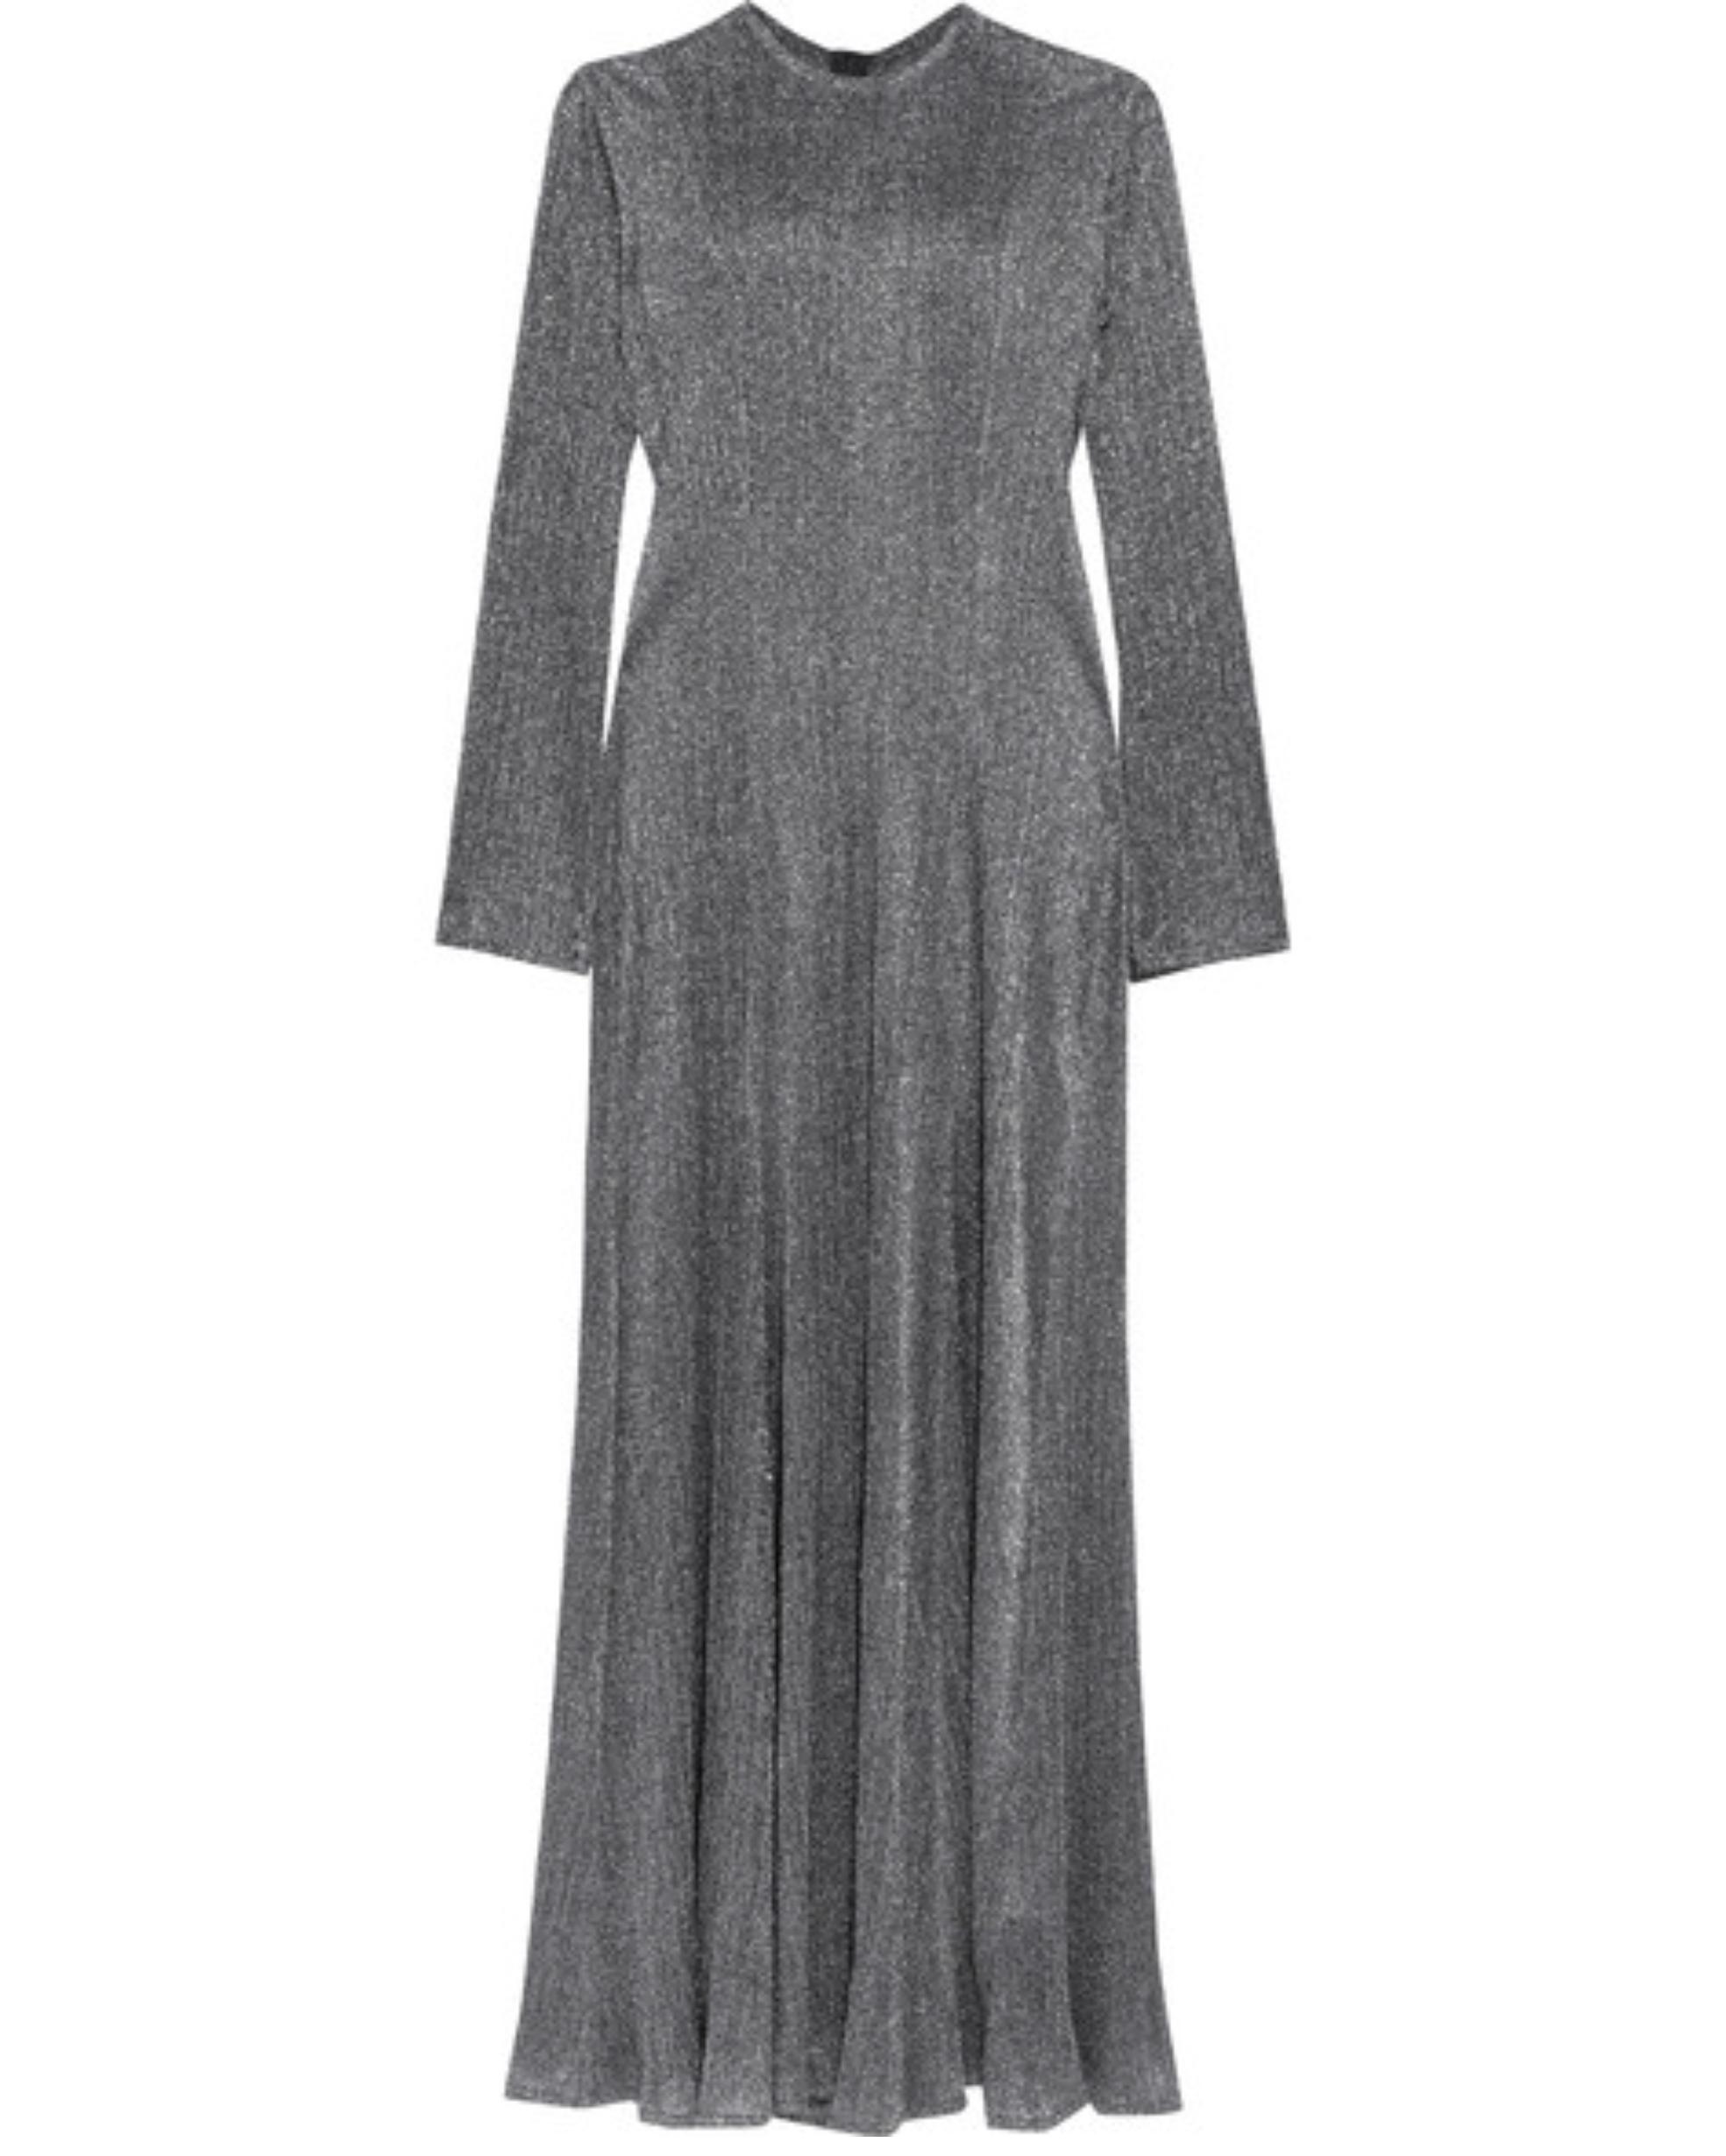 long-sleeve grey dress